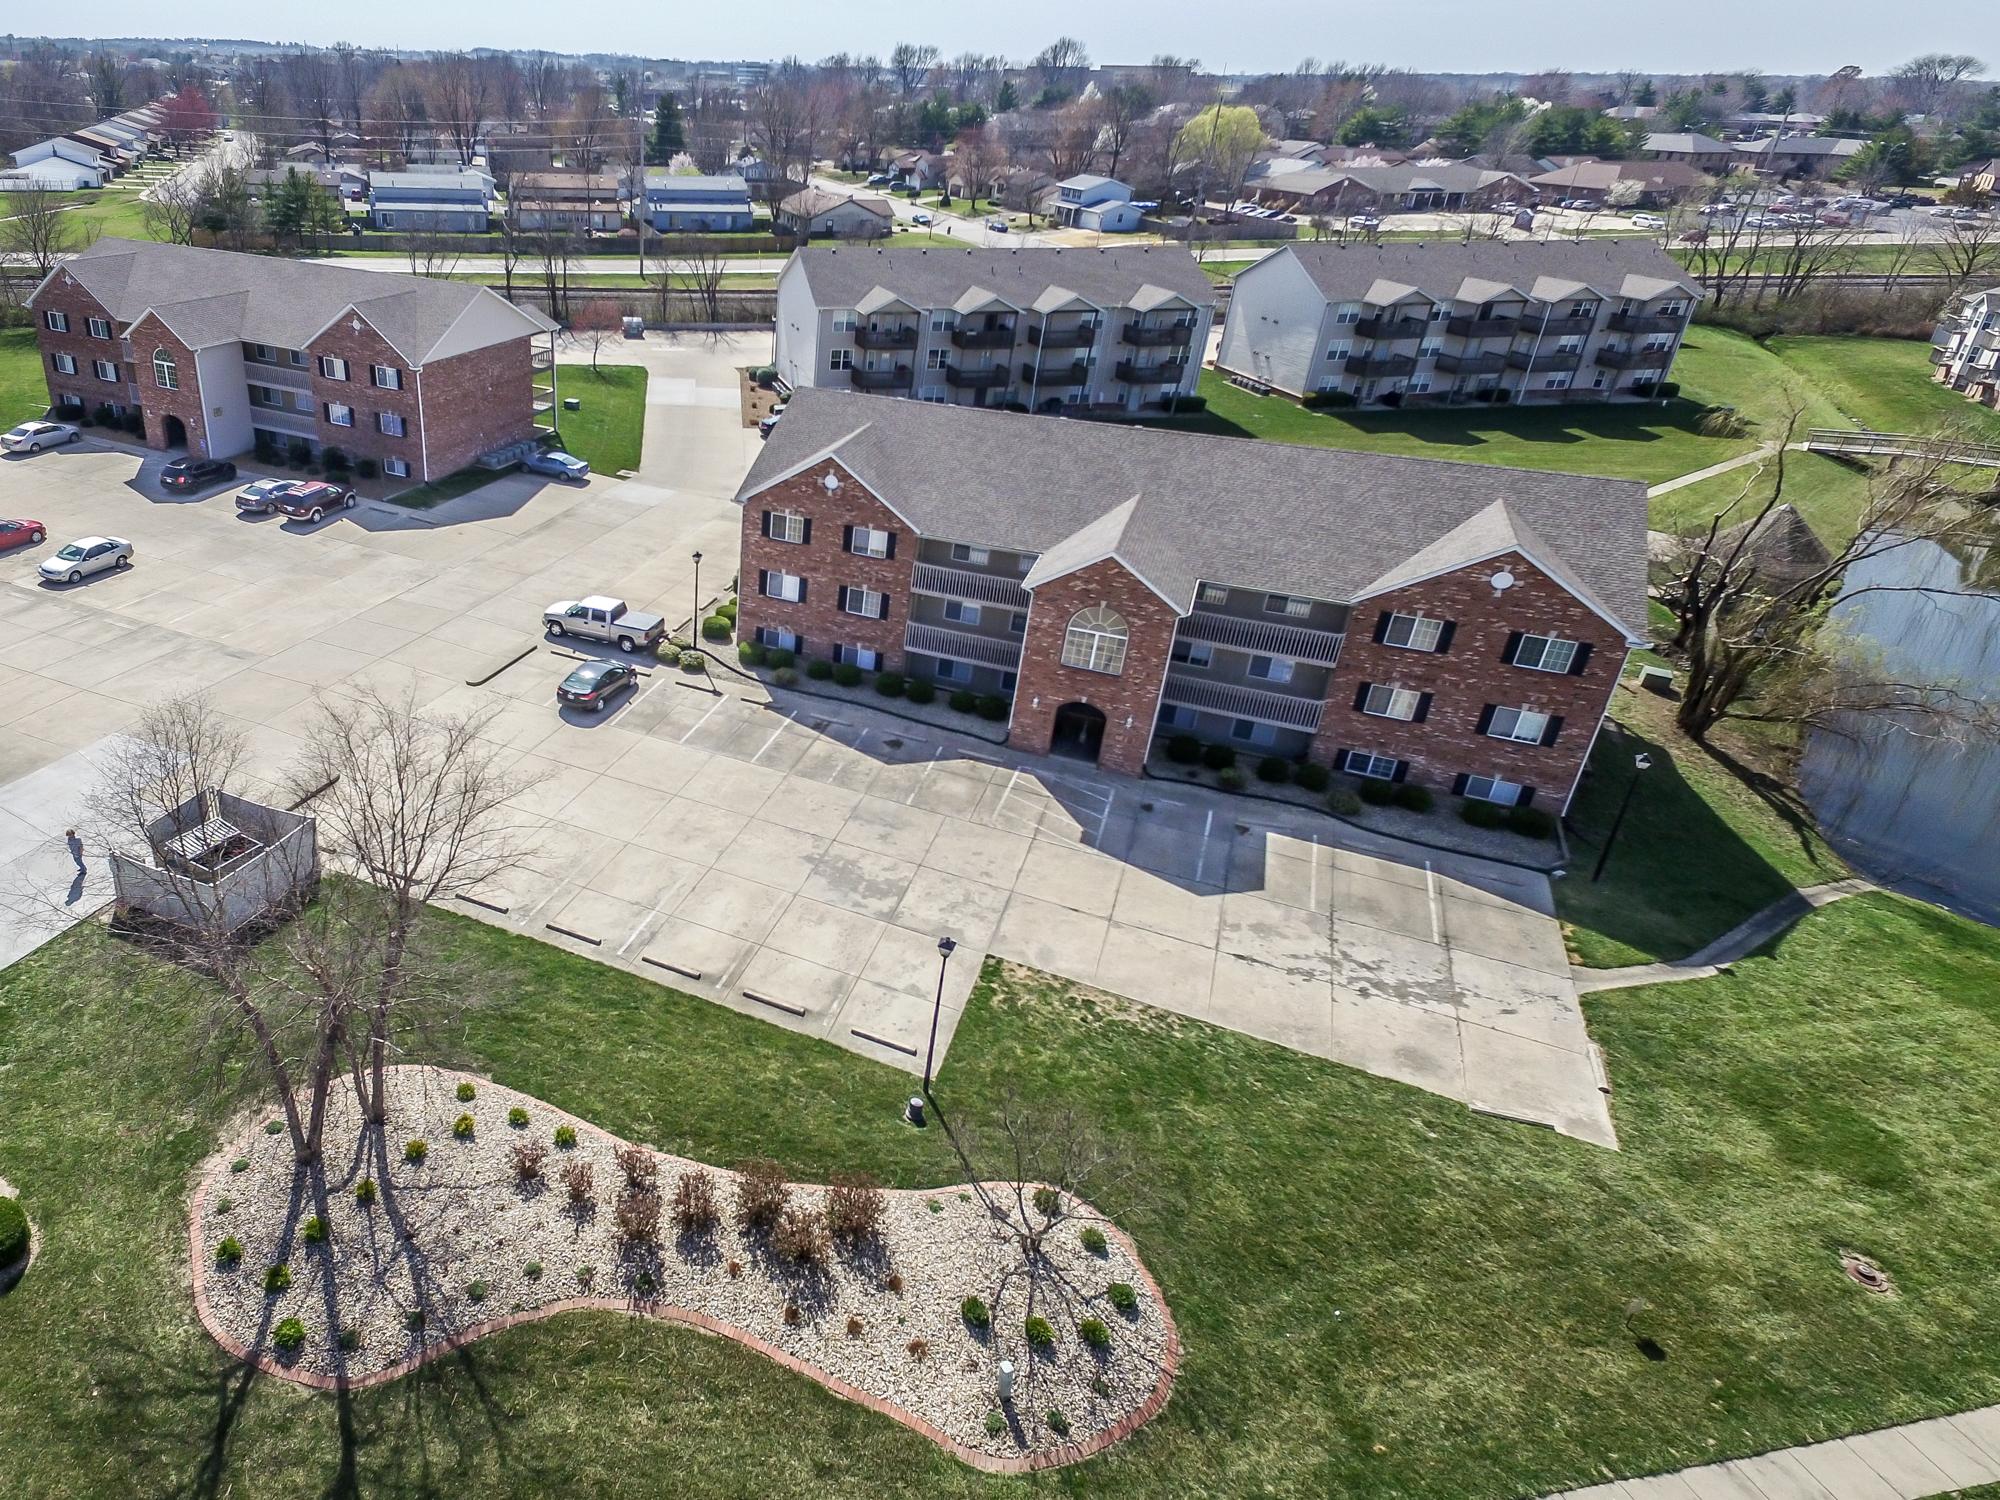 Brookside-Apartments-O'Fallon-Illinois-Aerials-1.jpg